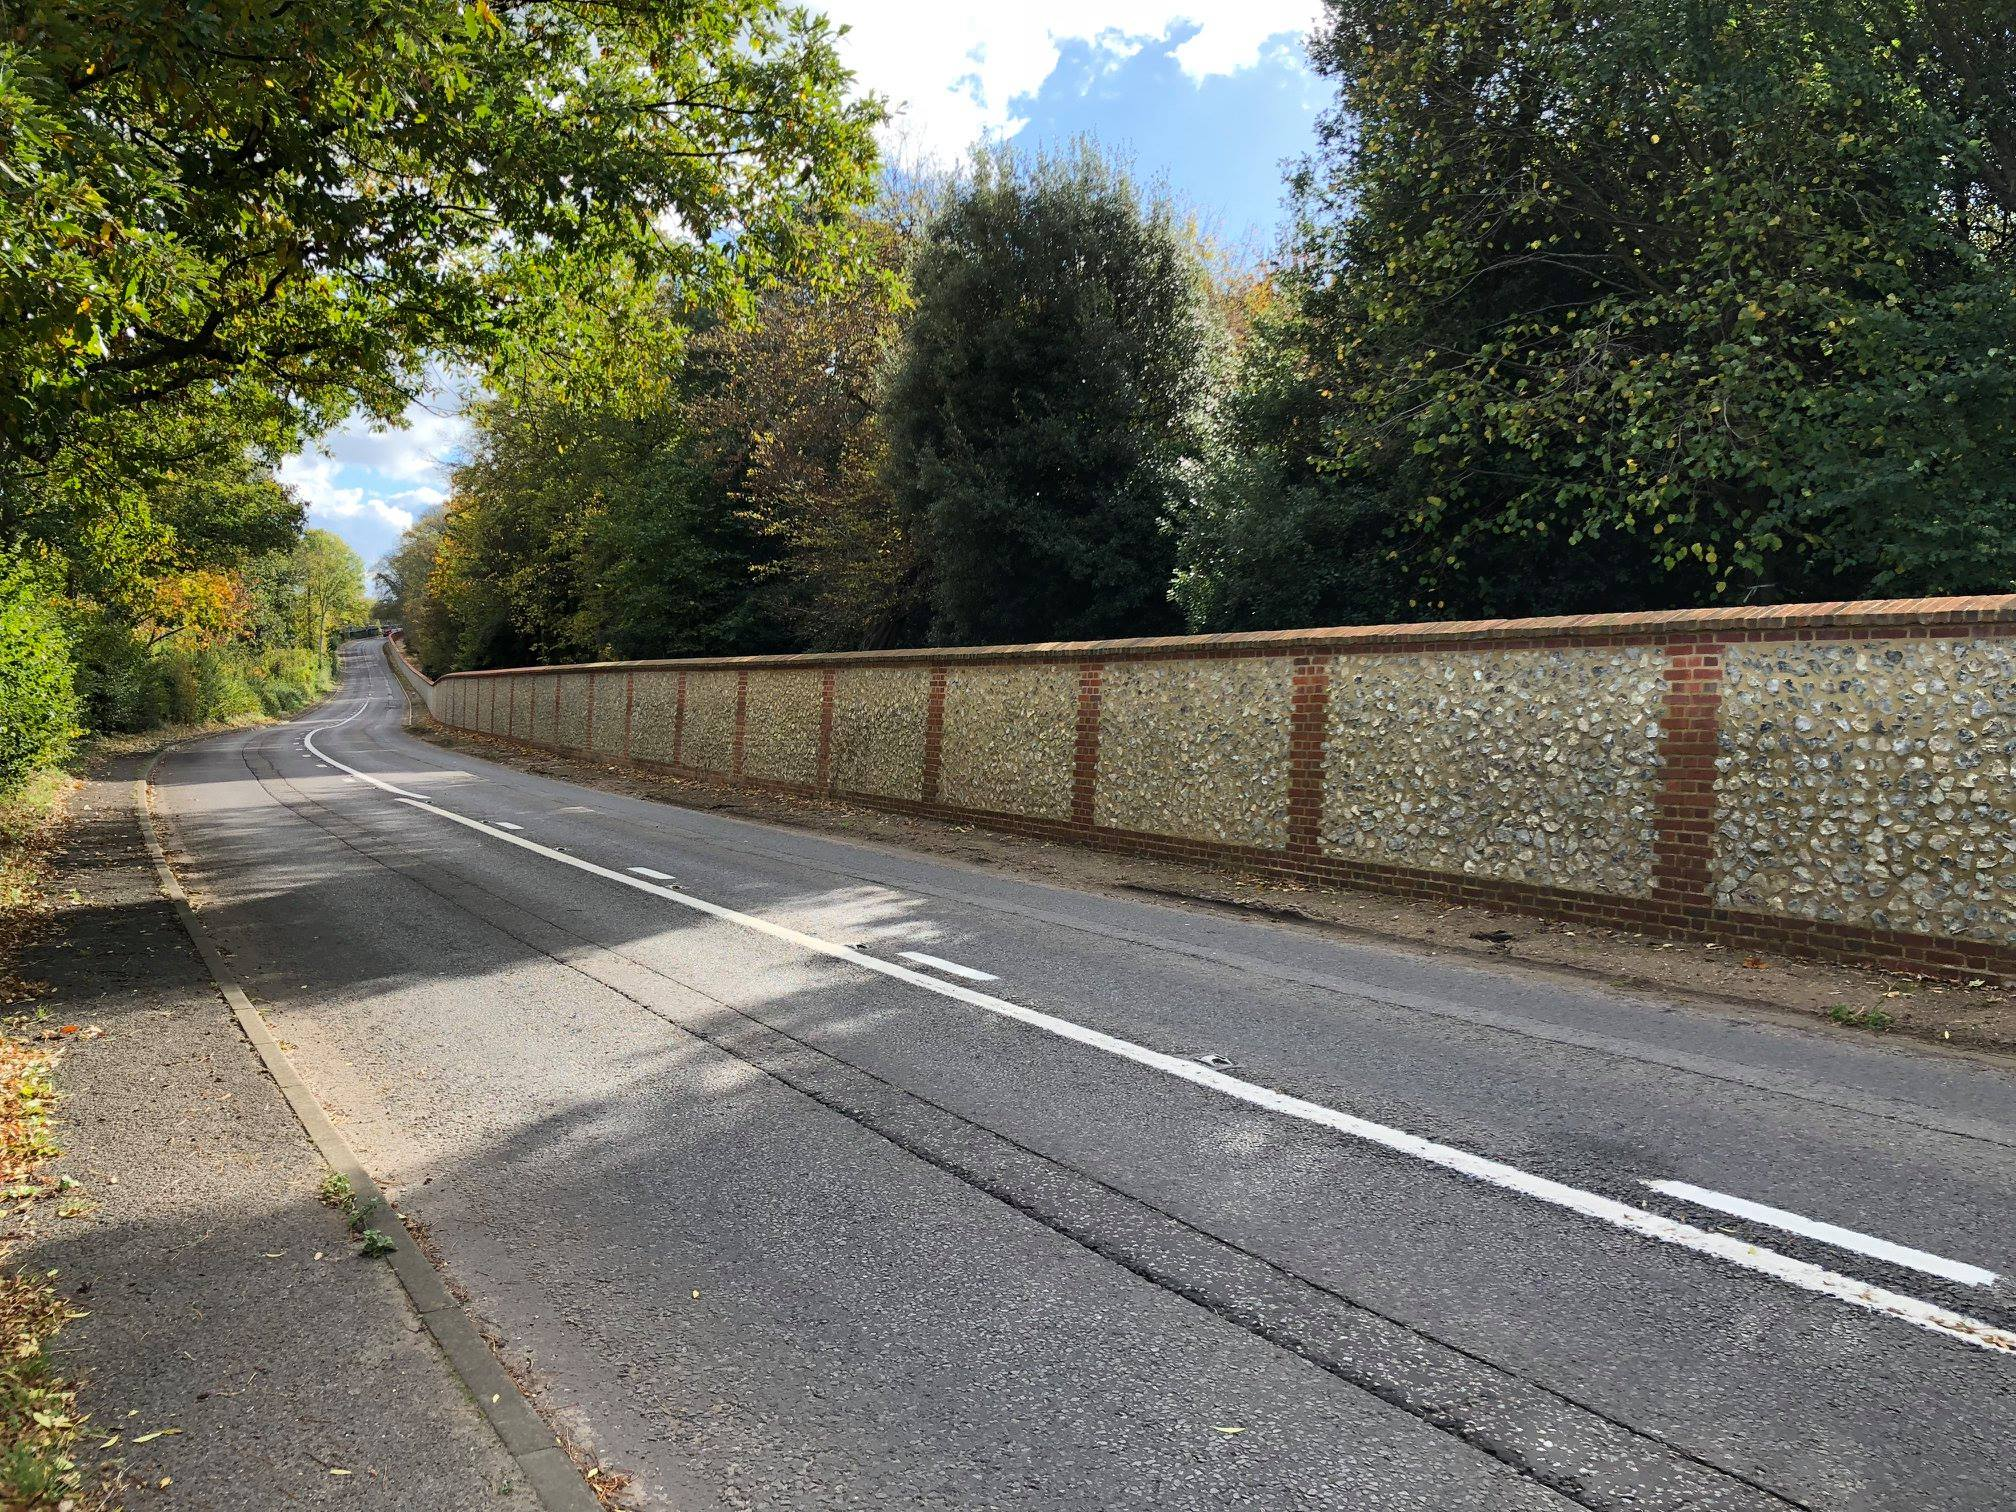 Basildon wall national trust loose flint